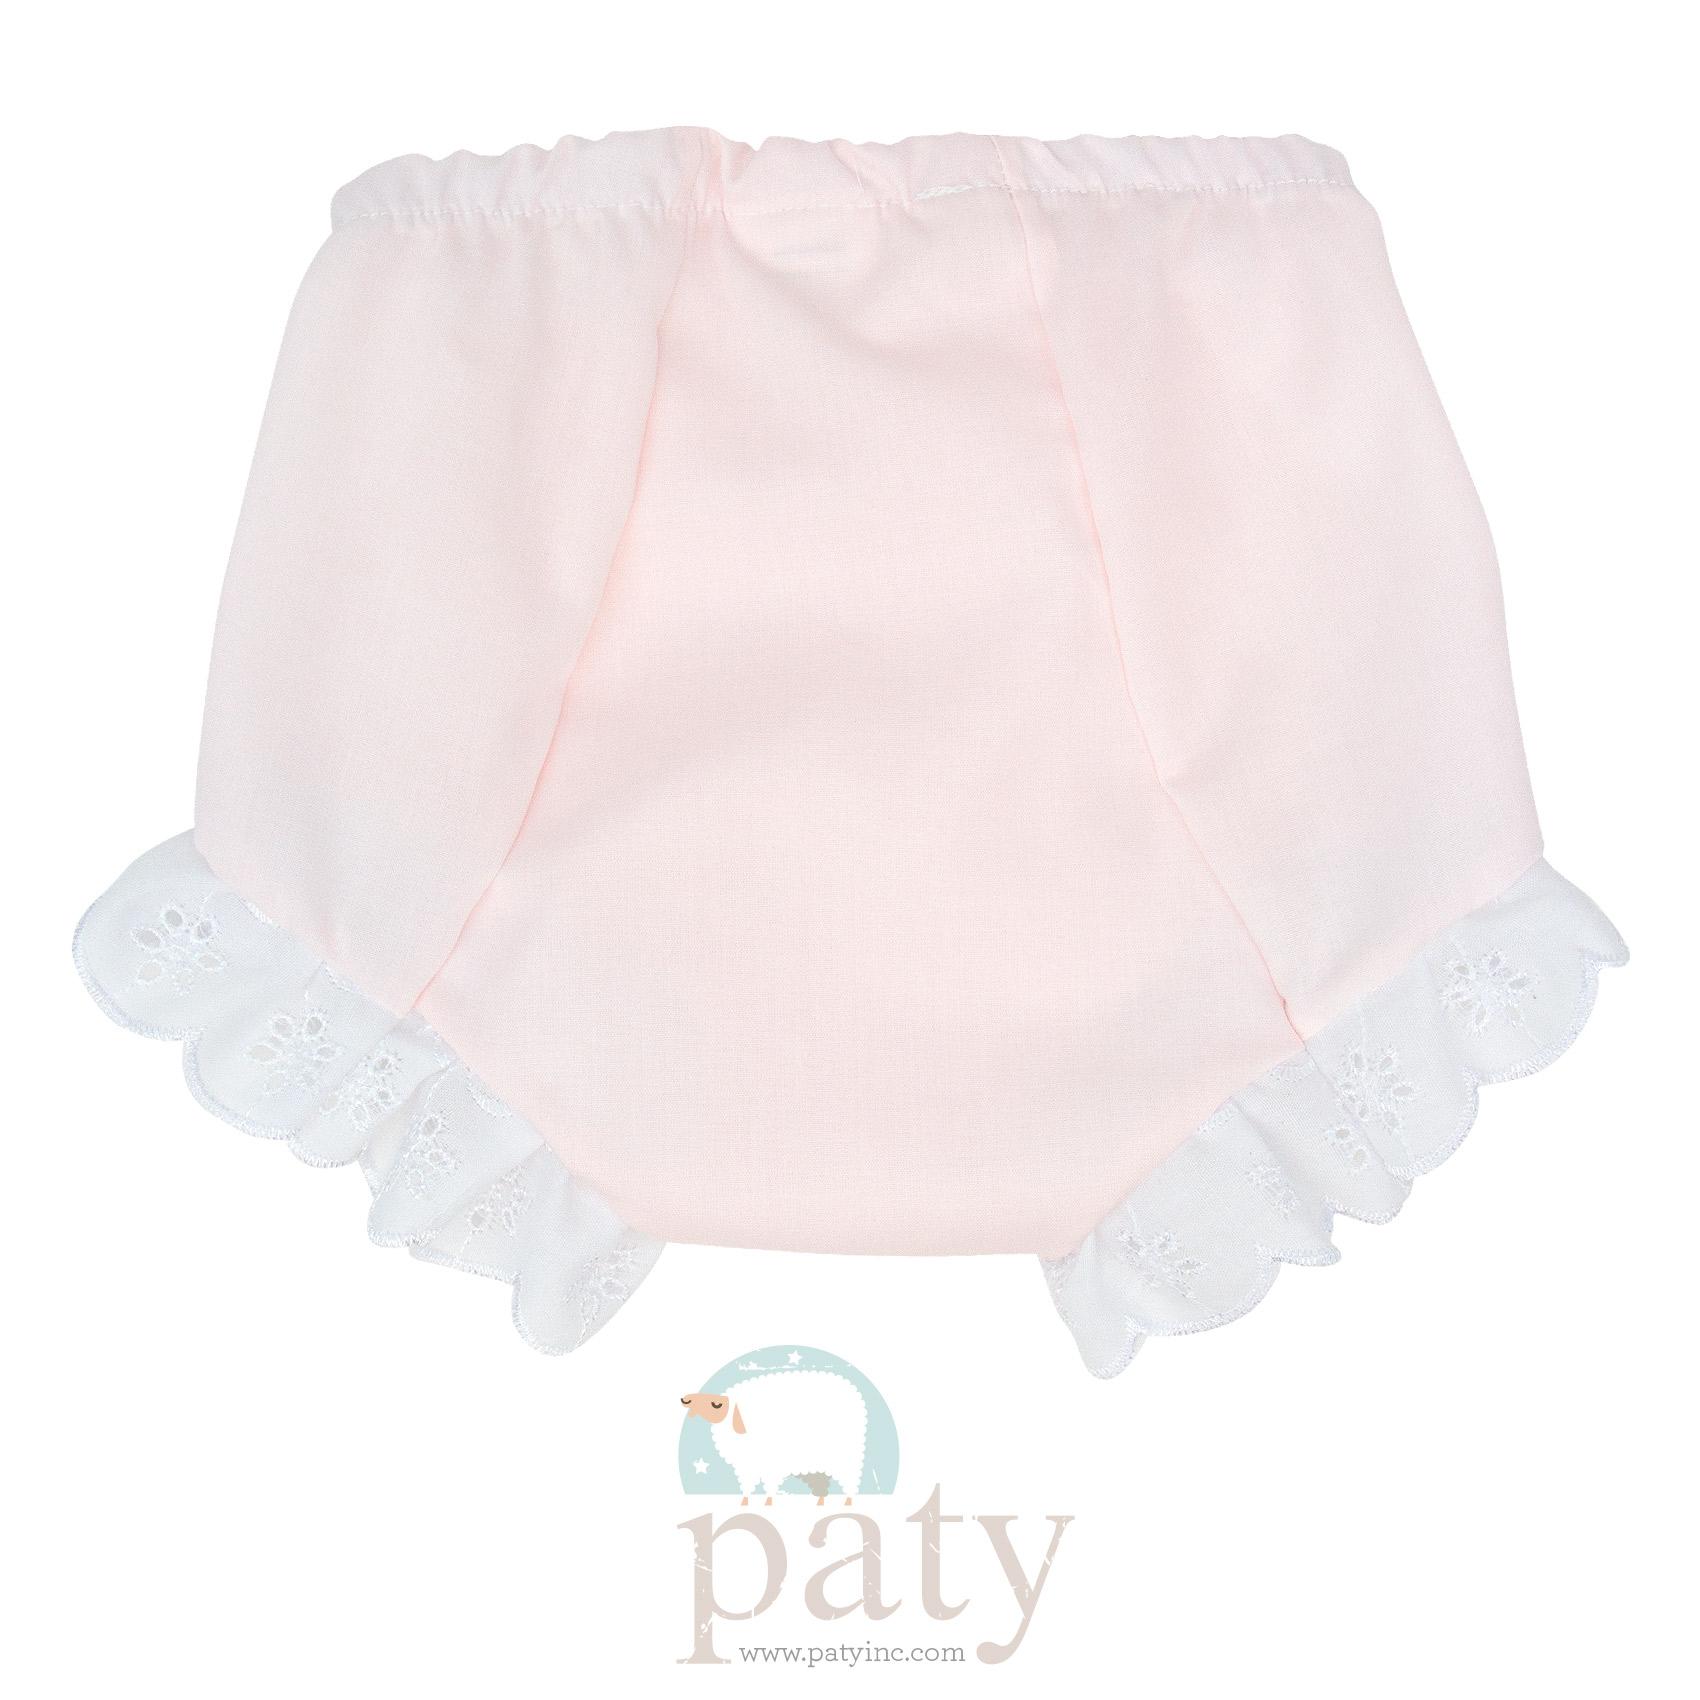 Eyelet Diaper Cover - Pink Imperial Batiste Back